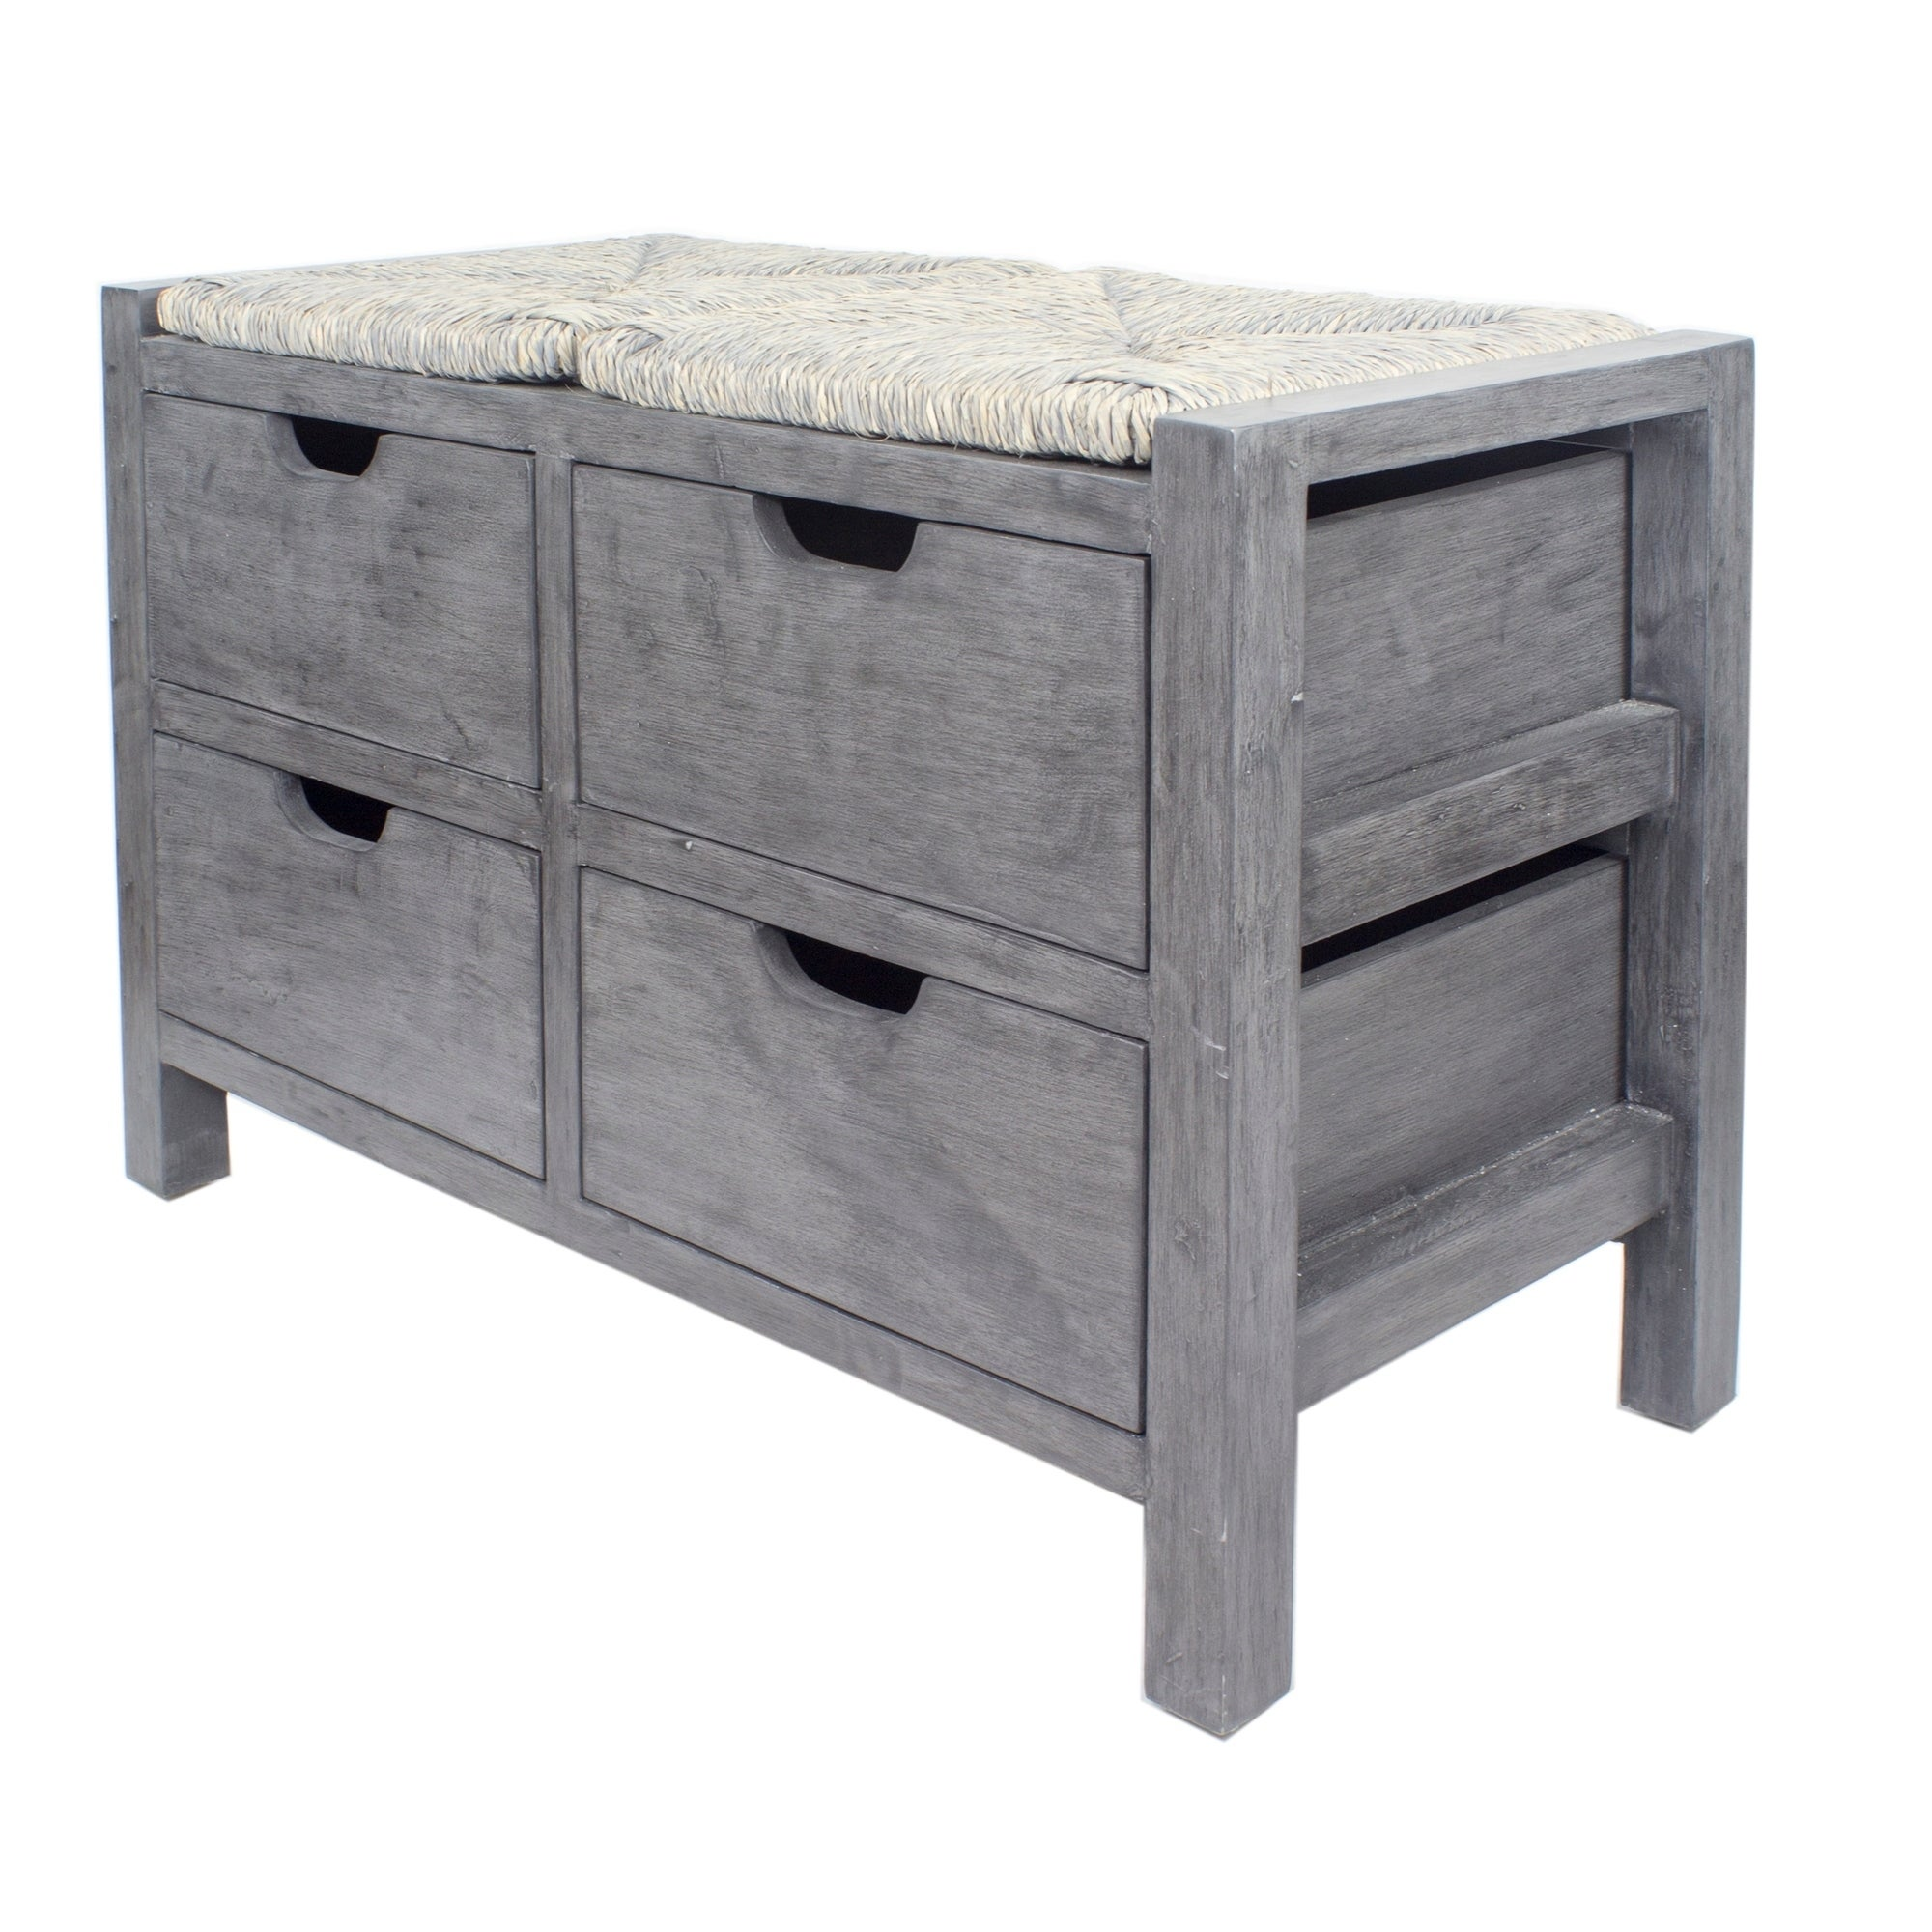 Lake 4 Drawer Storage Bench On Sale Overstock 28000880